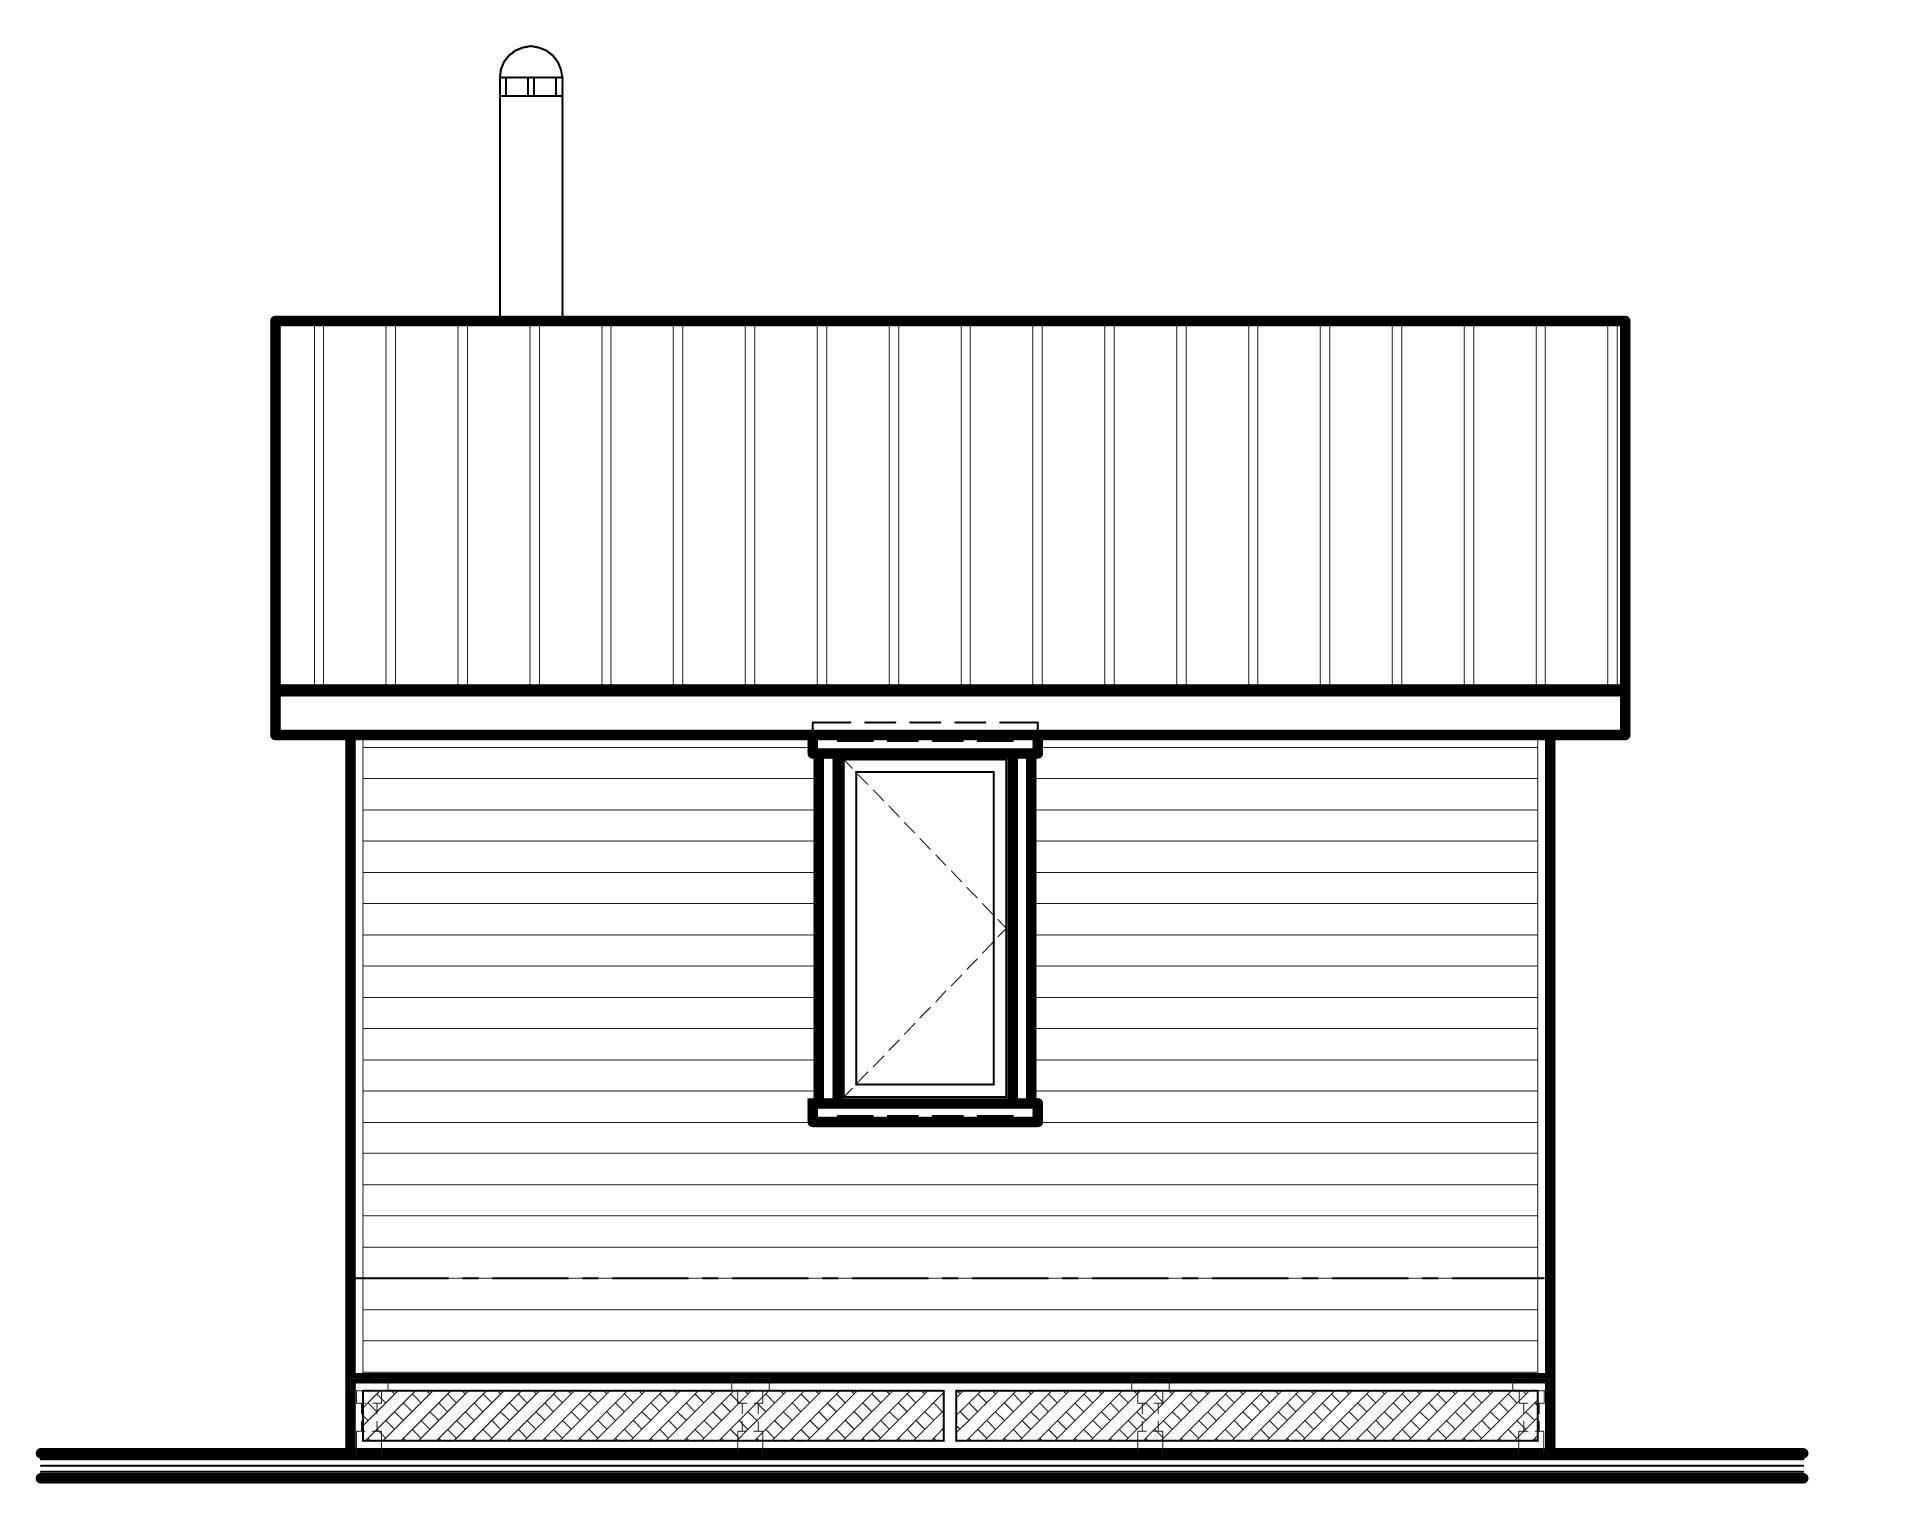 Vacation Home Design DD-1901